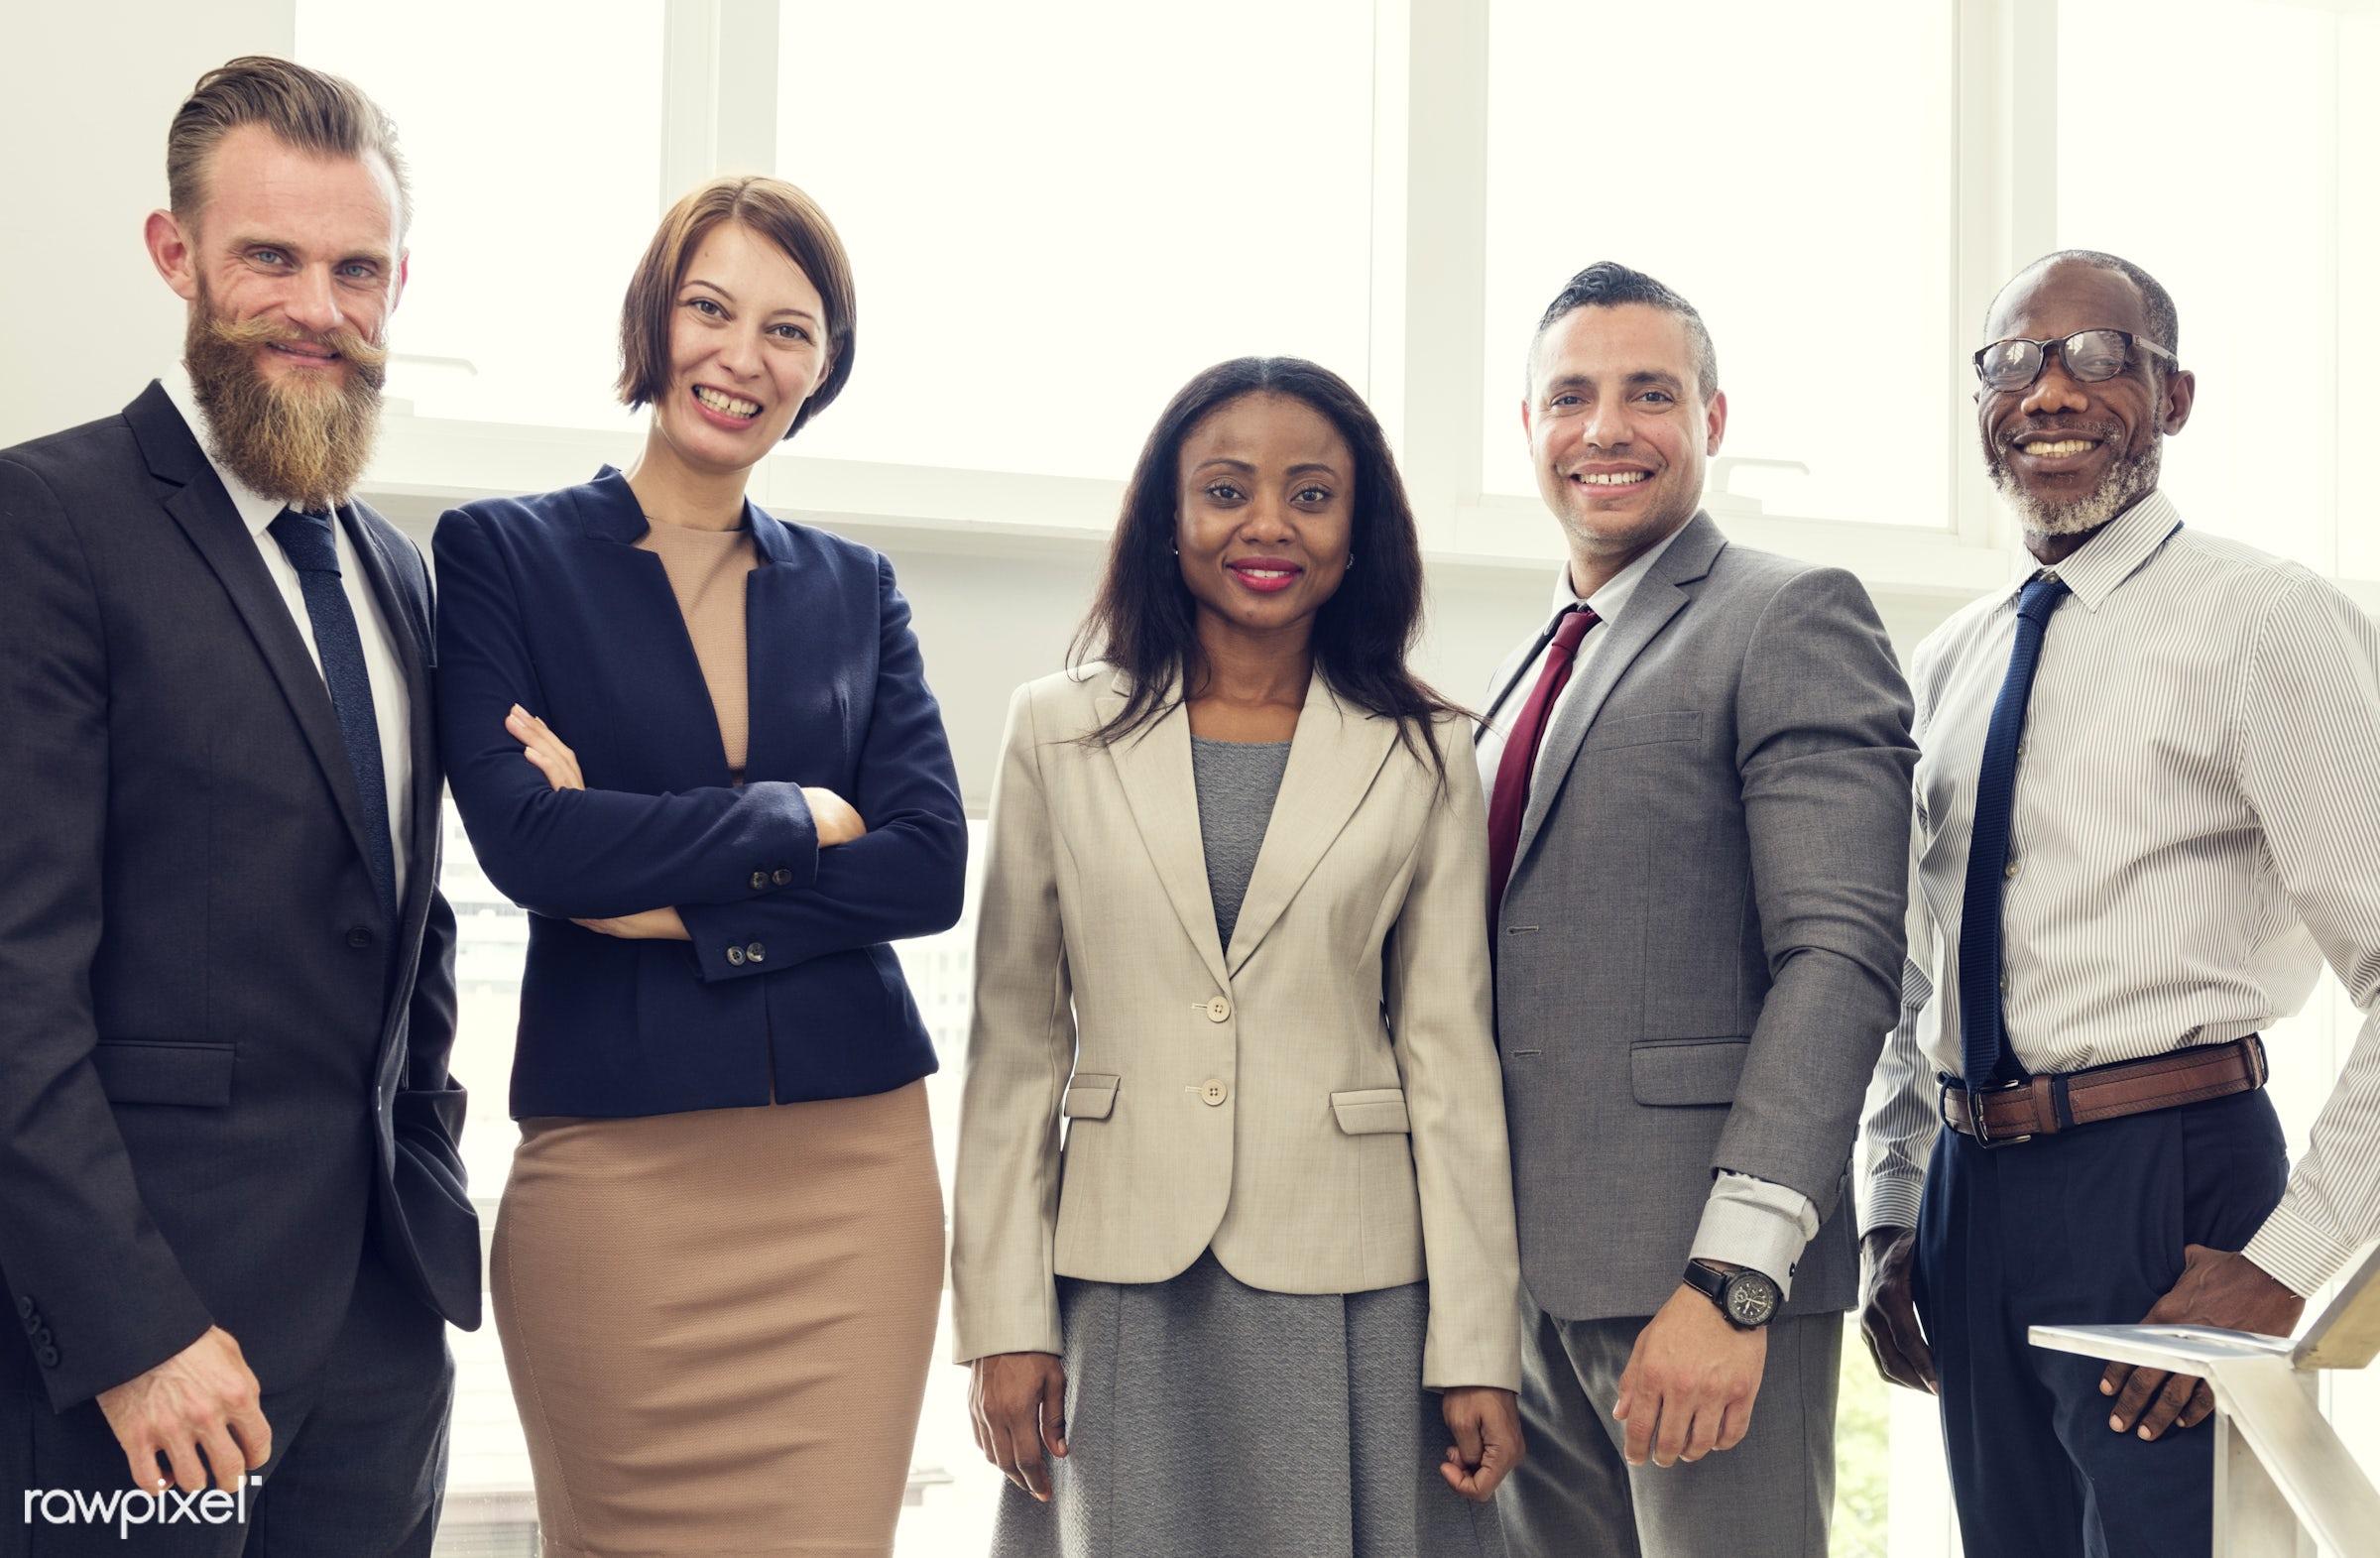 african descent, agreement, analysing, business, connection, corporate, corporation, coworker, diversity, entrepreneur,...